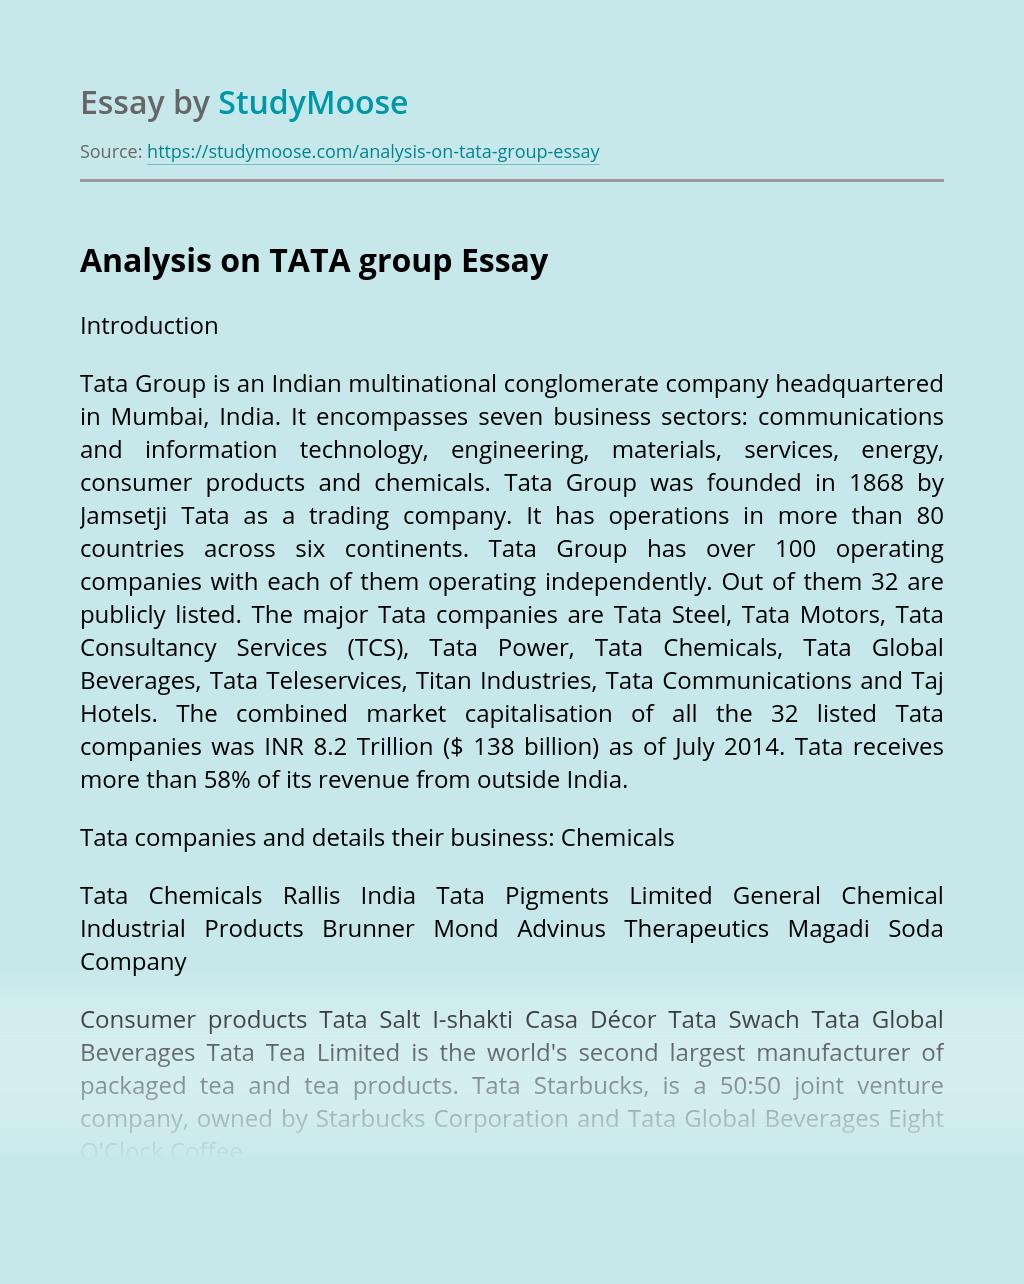 Analysis on TATA group